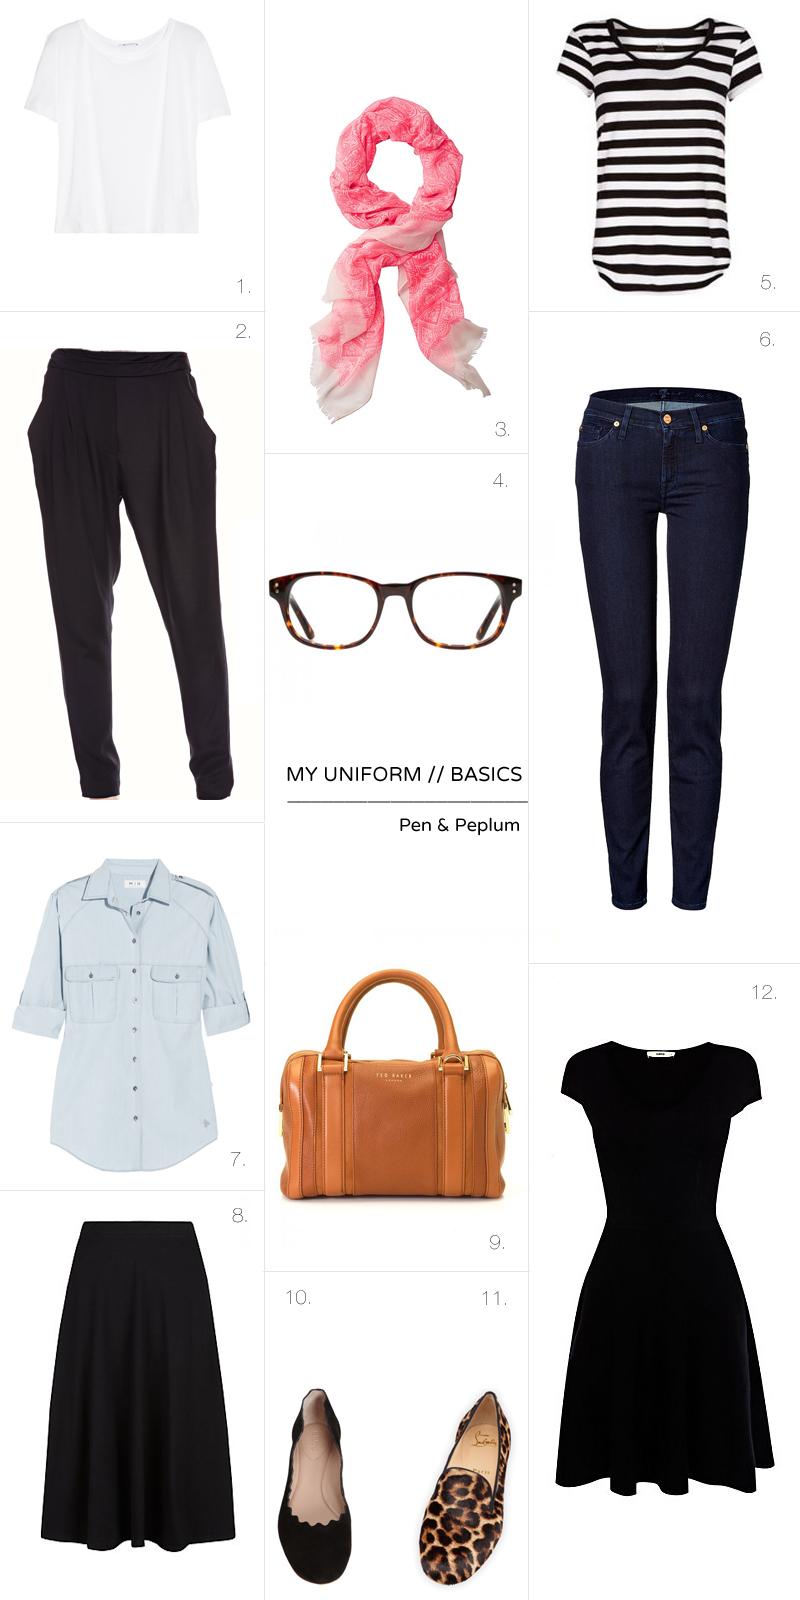 Wardrobe Capsule: Wardrobe: A Capsule Wardrobe